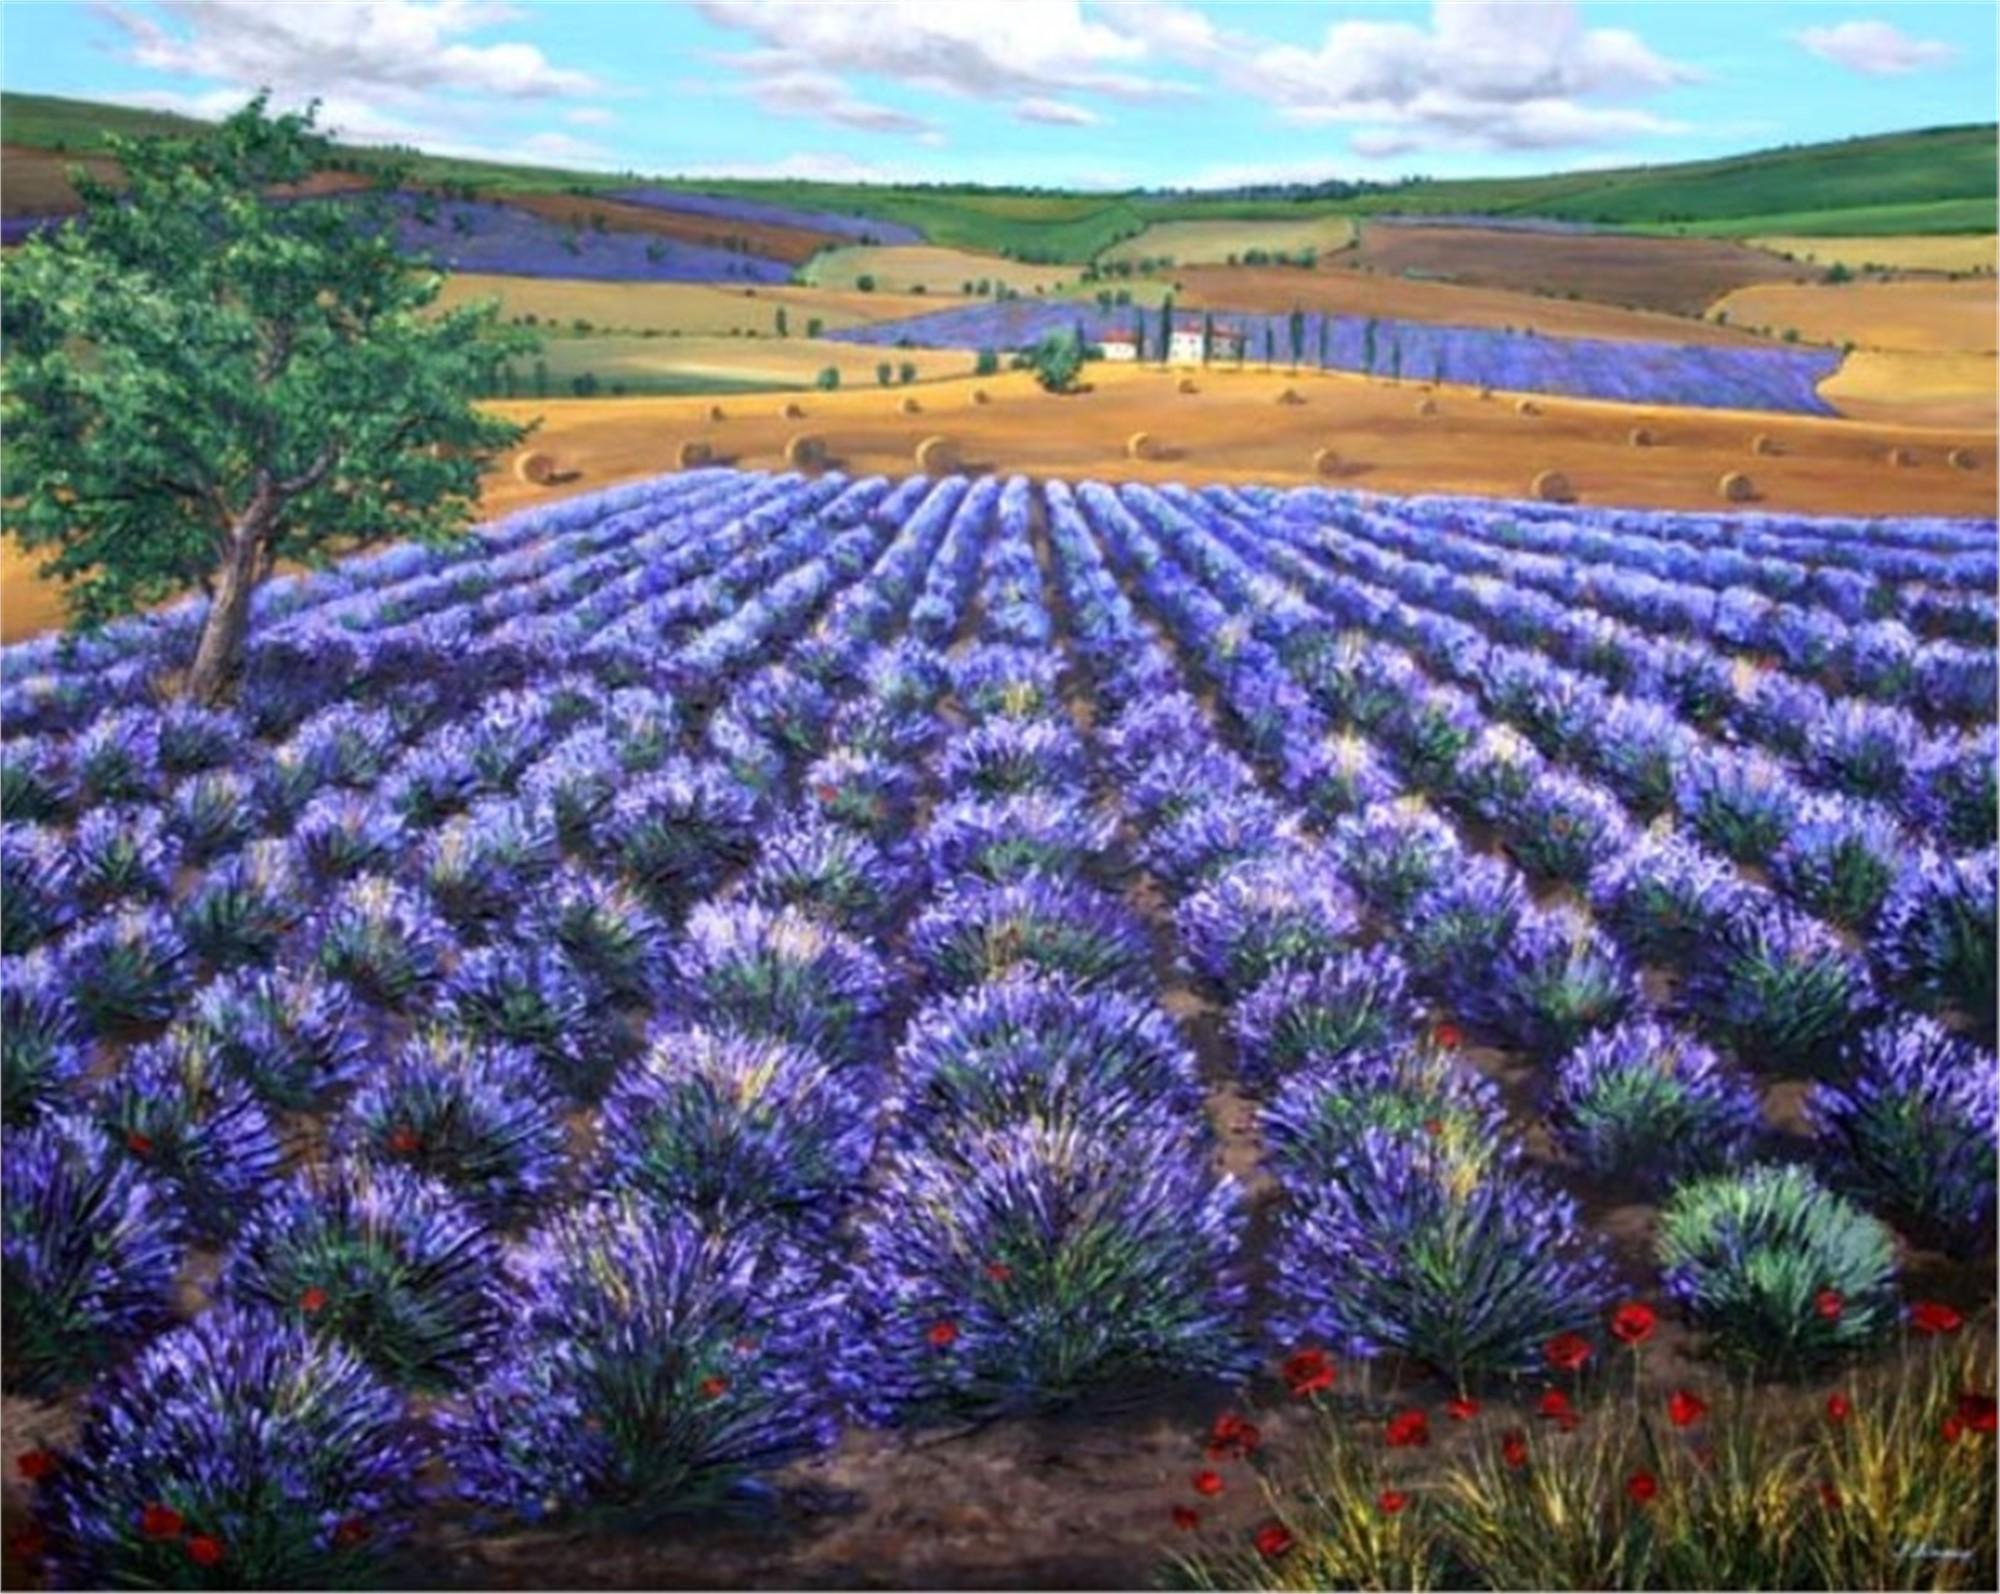 Dreaming of Lavender by Jennifer Vranes